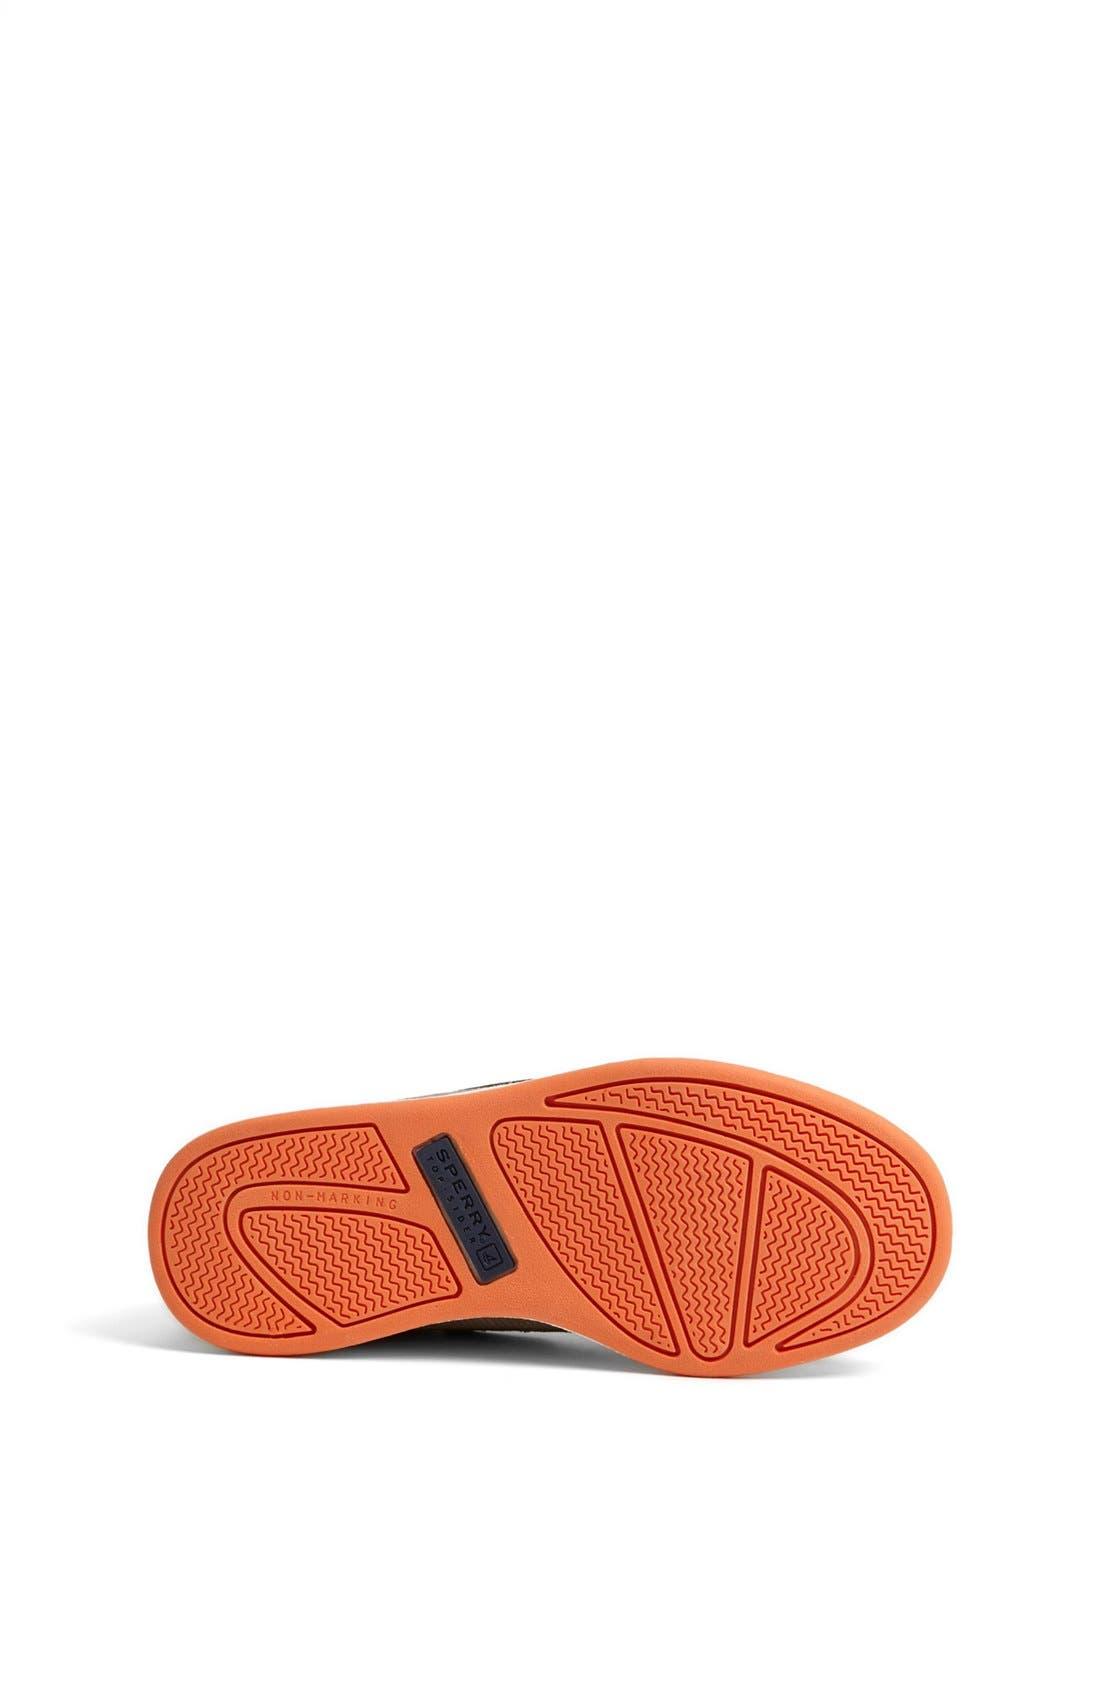 Alternate Image 4  - Sperry Top-Sider® 'Cupsole' Loafer (Toddler, Little Kid & Big Kid)